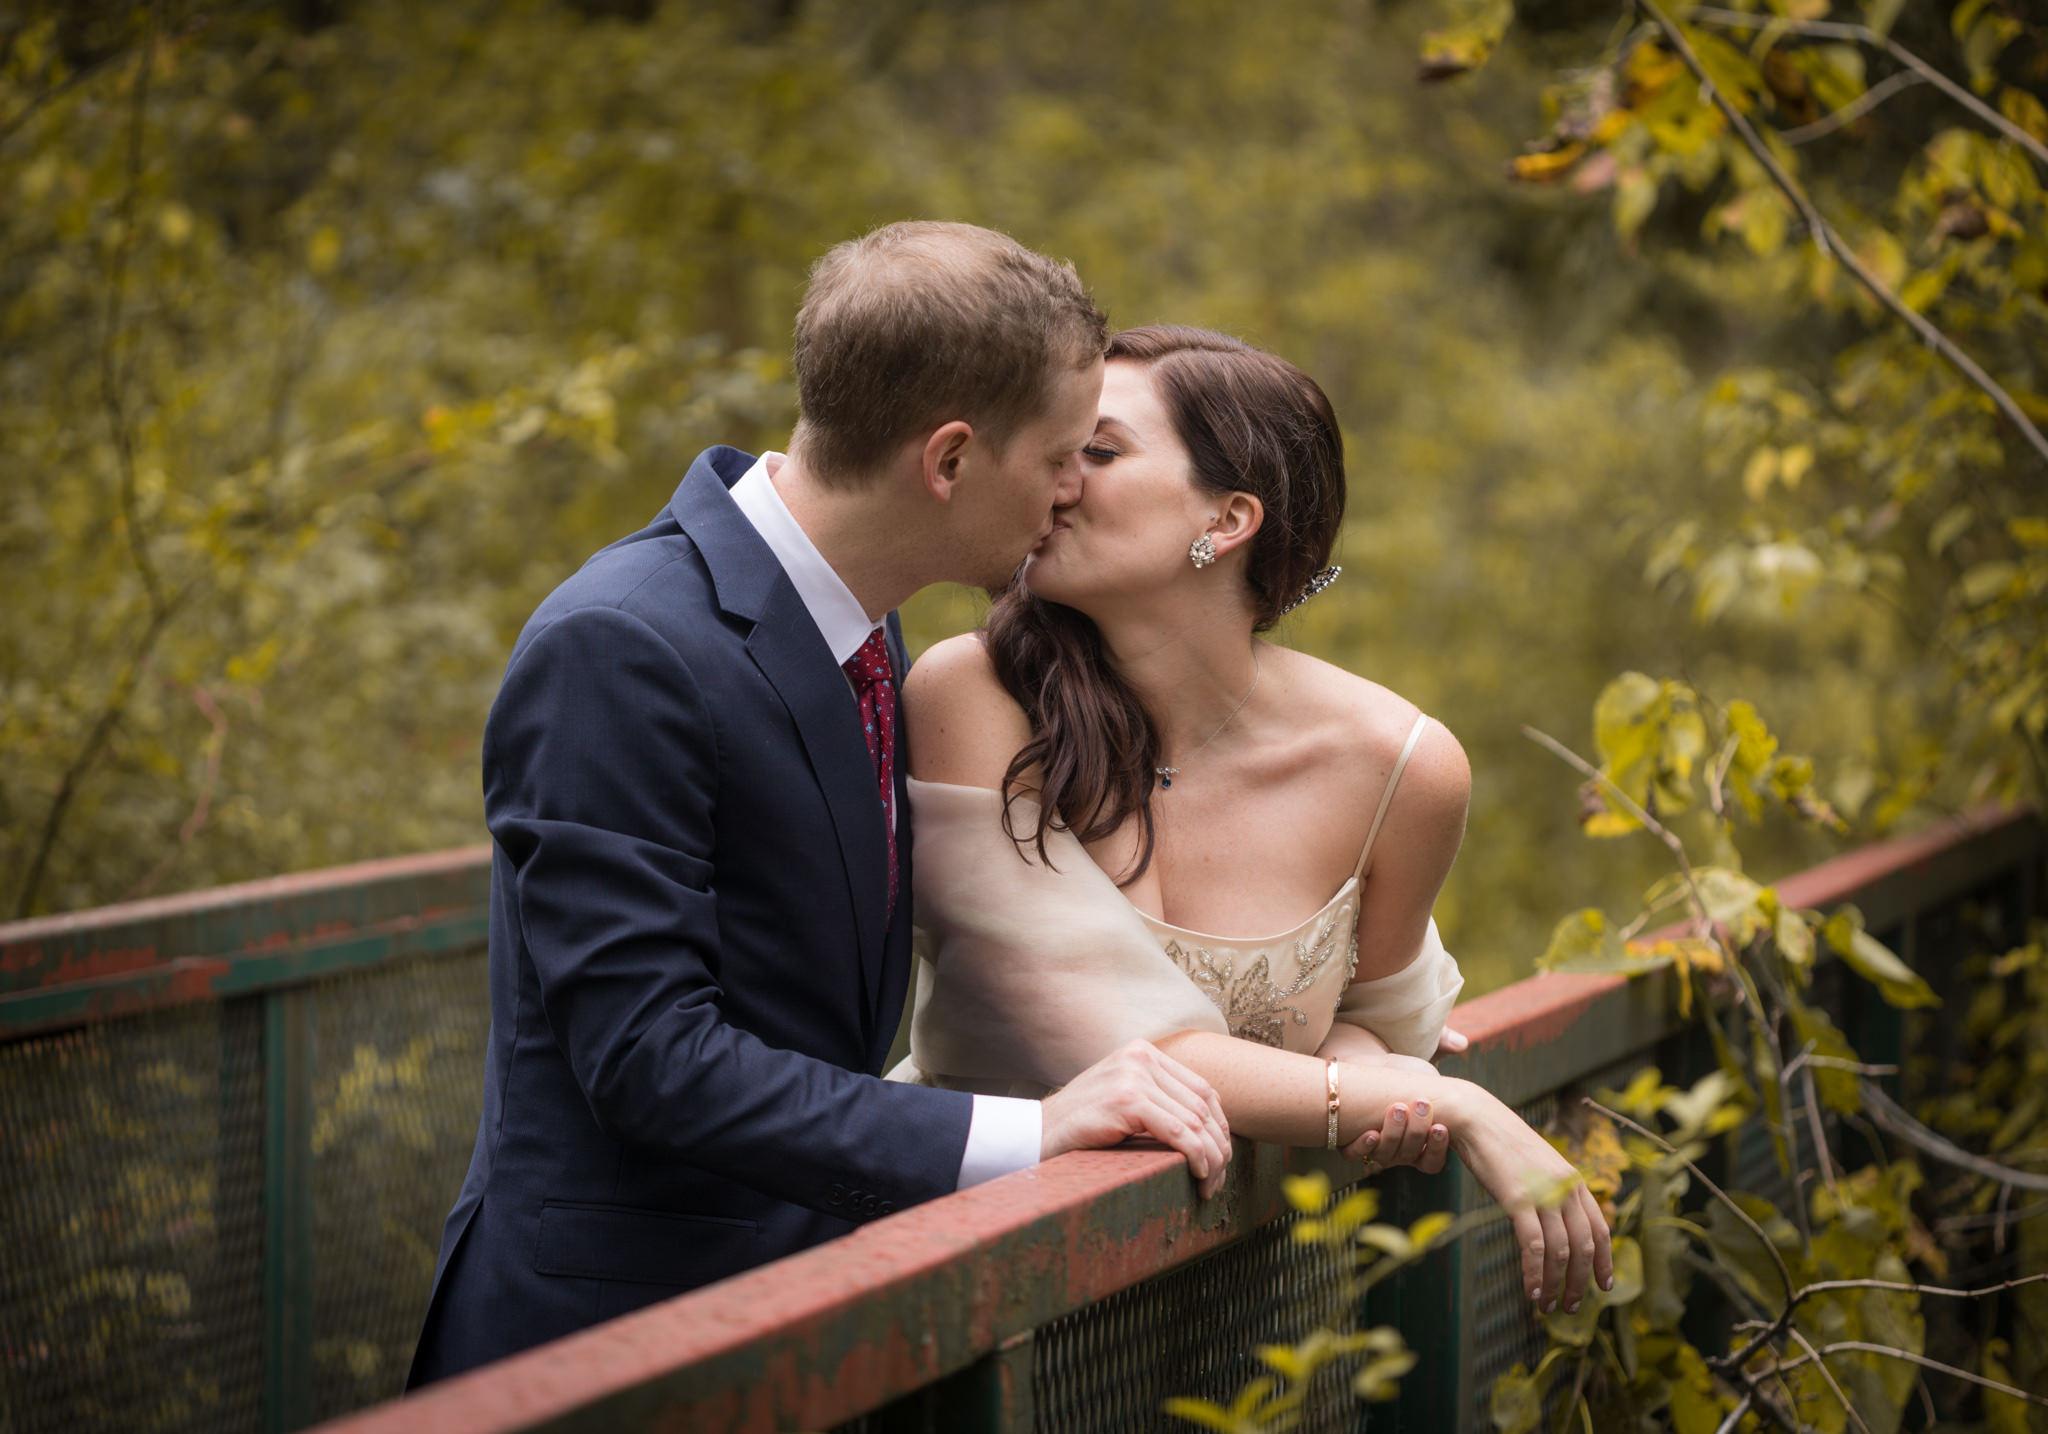 Toronto Wedding Photographer - 1 - 7092.jpg